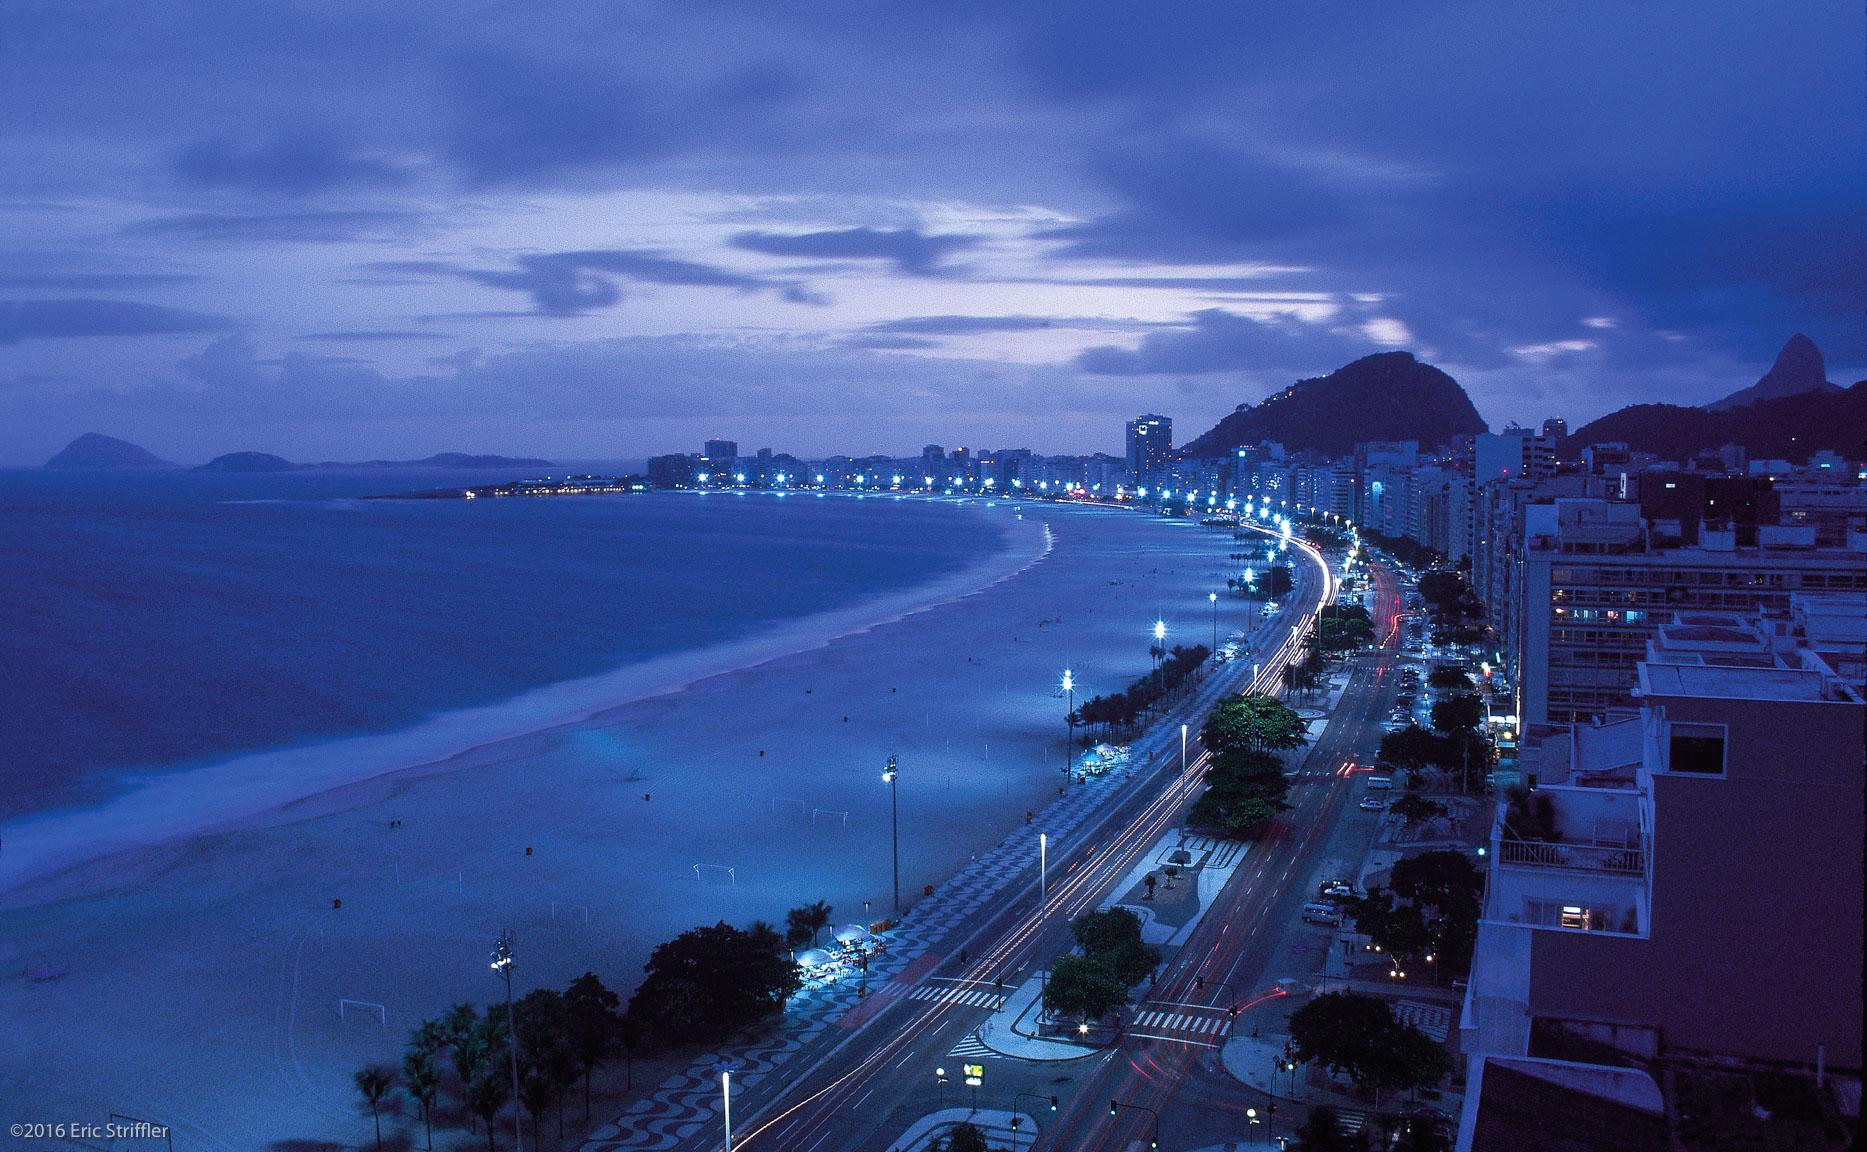 Copacabana Beach at night, Rio